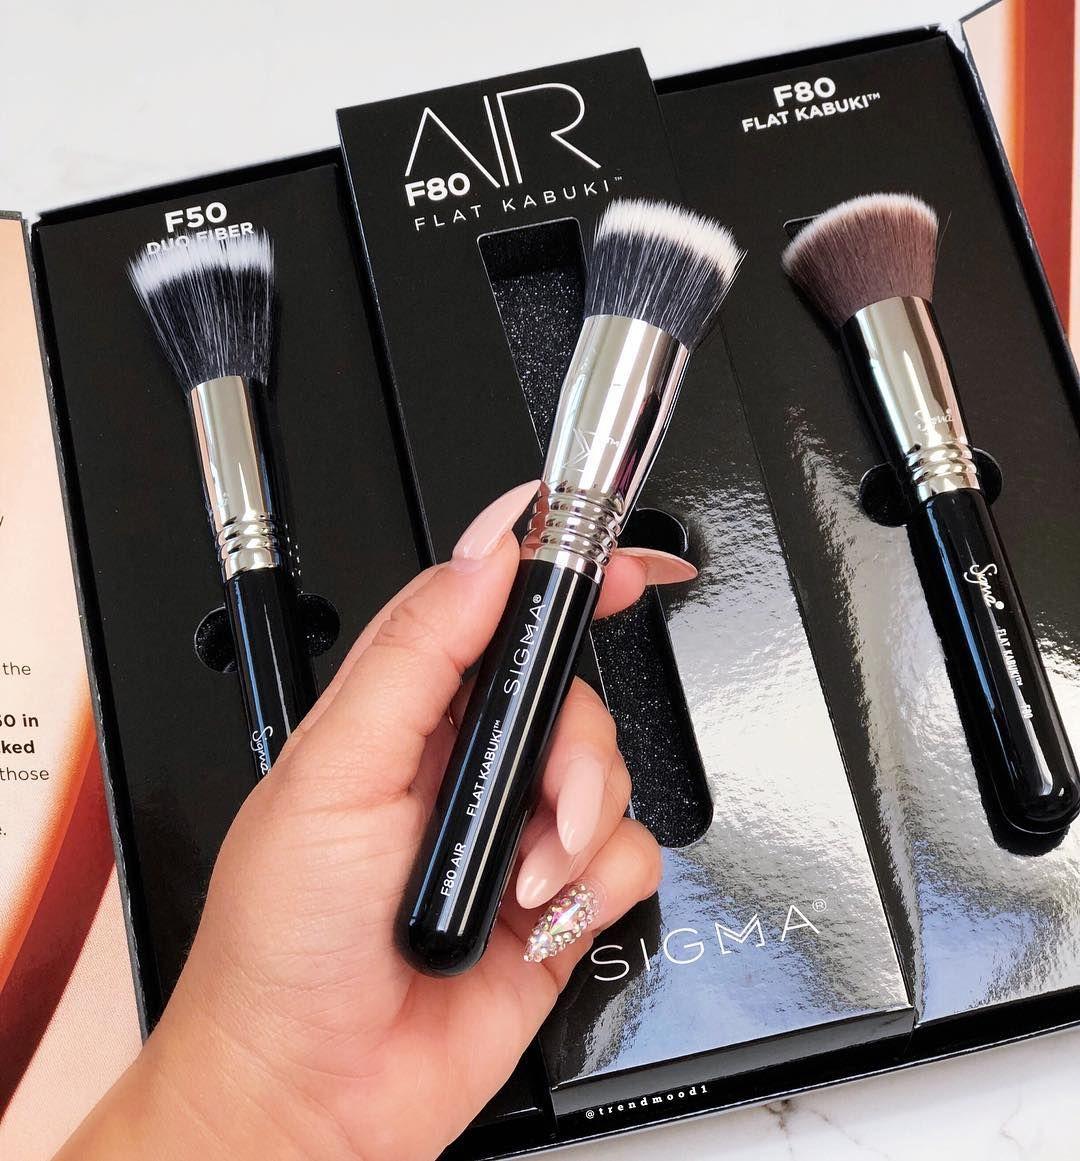 F80 Air Flat Kabuki™ Foundation brush, Makeup junkie